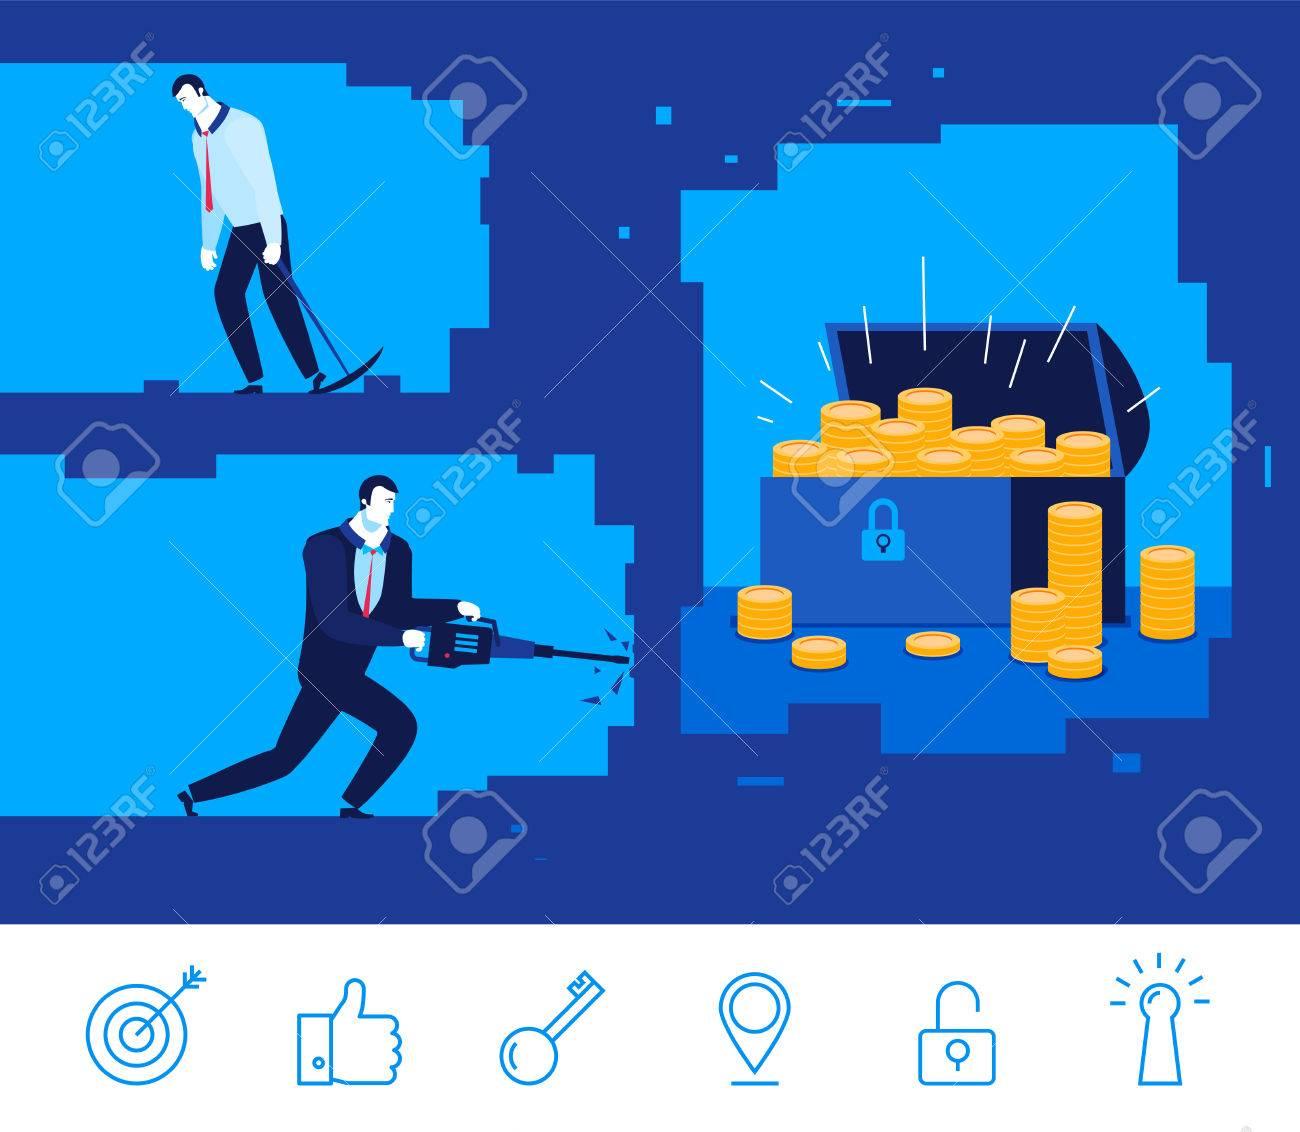 Flat design concept illustration. Two businessman digging the ground. Good profit. Unsuccessful catch. clipart. Icons set. - 54303021